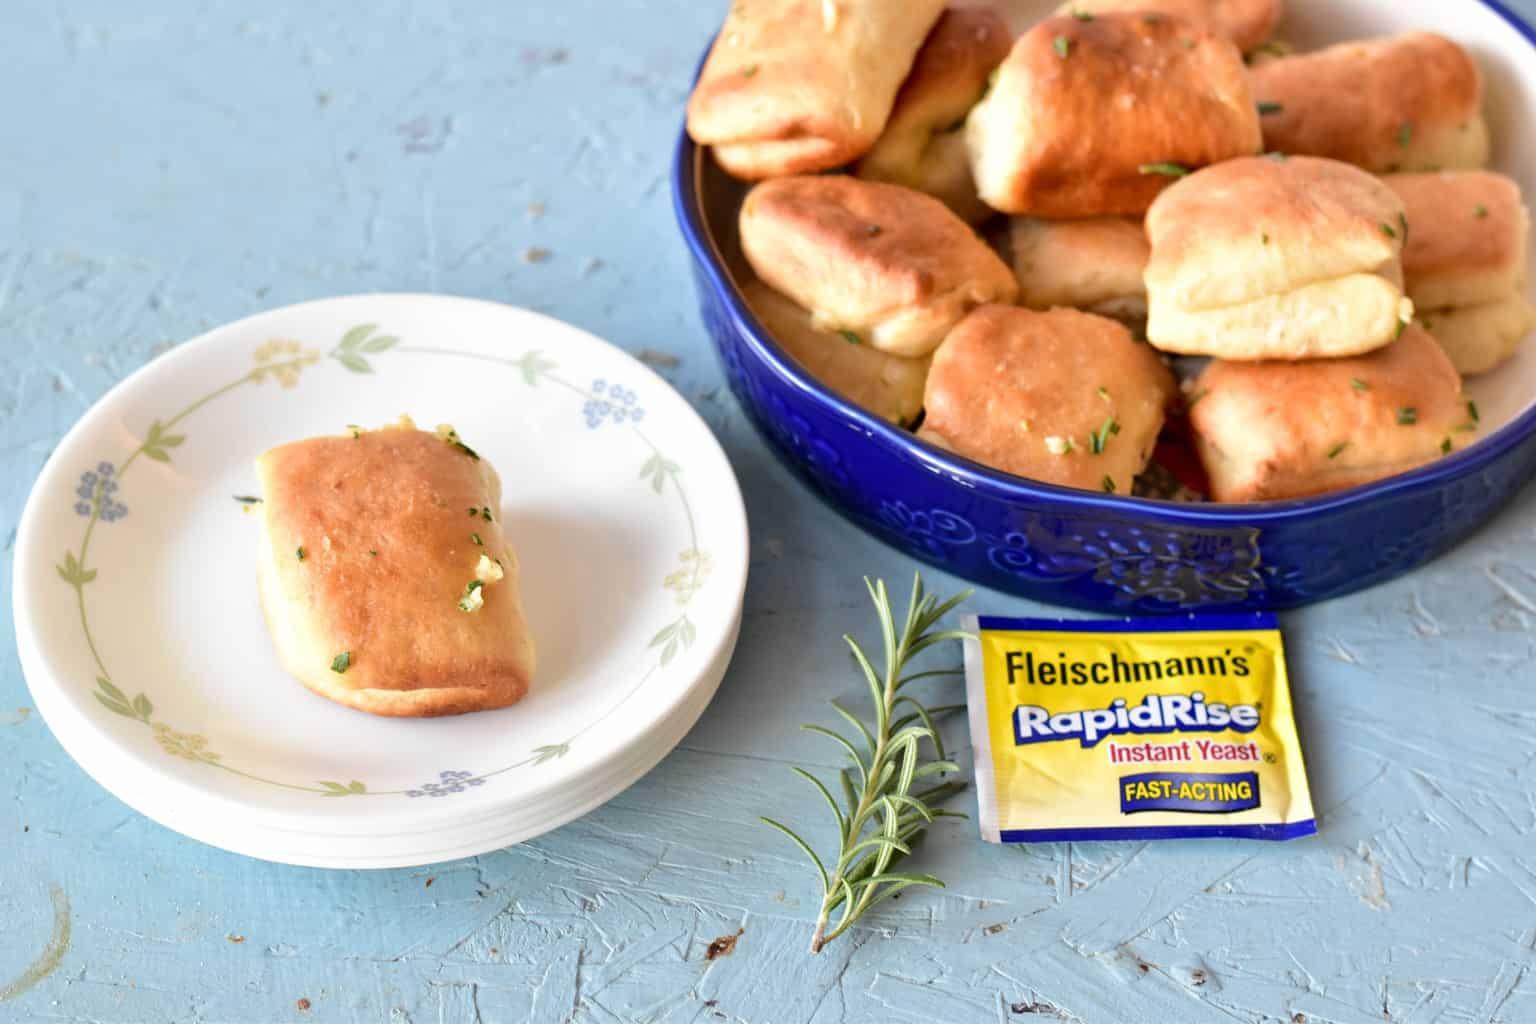 "<img src=""https://cdn.shortpixel.ai/client/q_glossy,ret_img,w_1536,h_1024/Garlic Rosemary Parker House Dinner Rolls.jpg"" alt=""Garlic Rosemary Parker House Dinner Rolls"">"